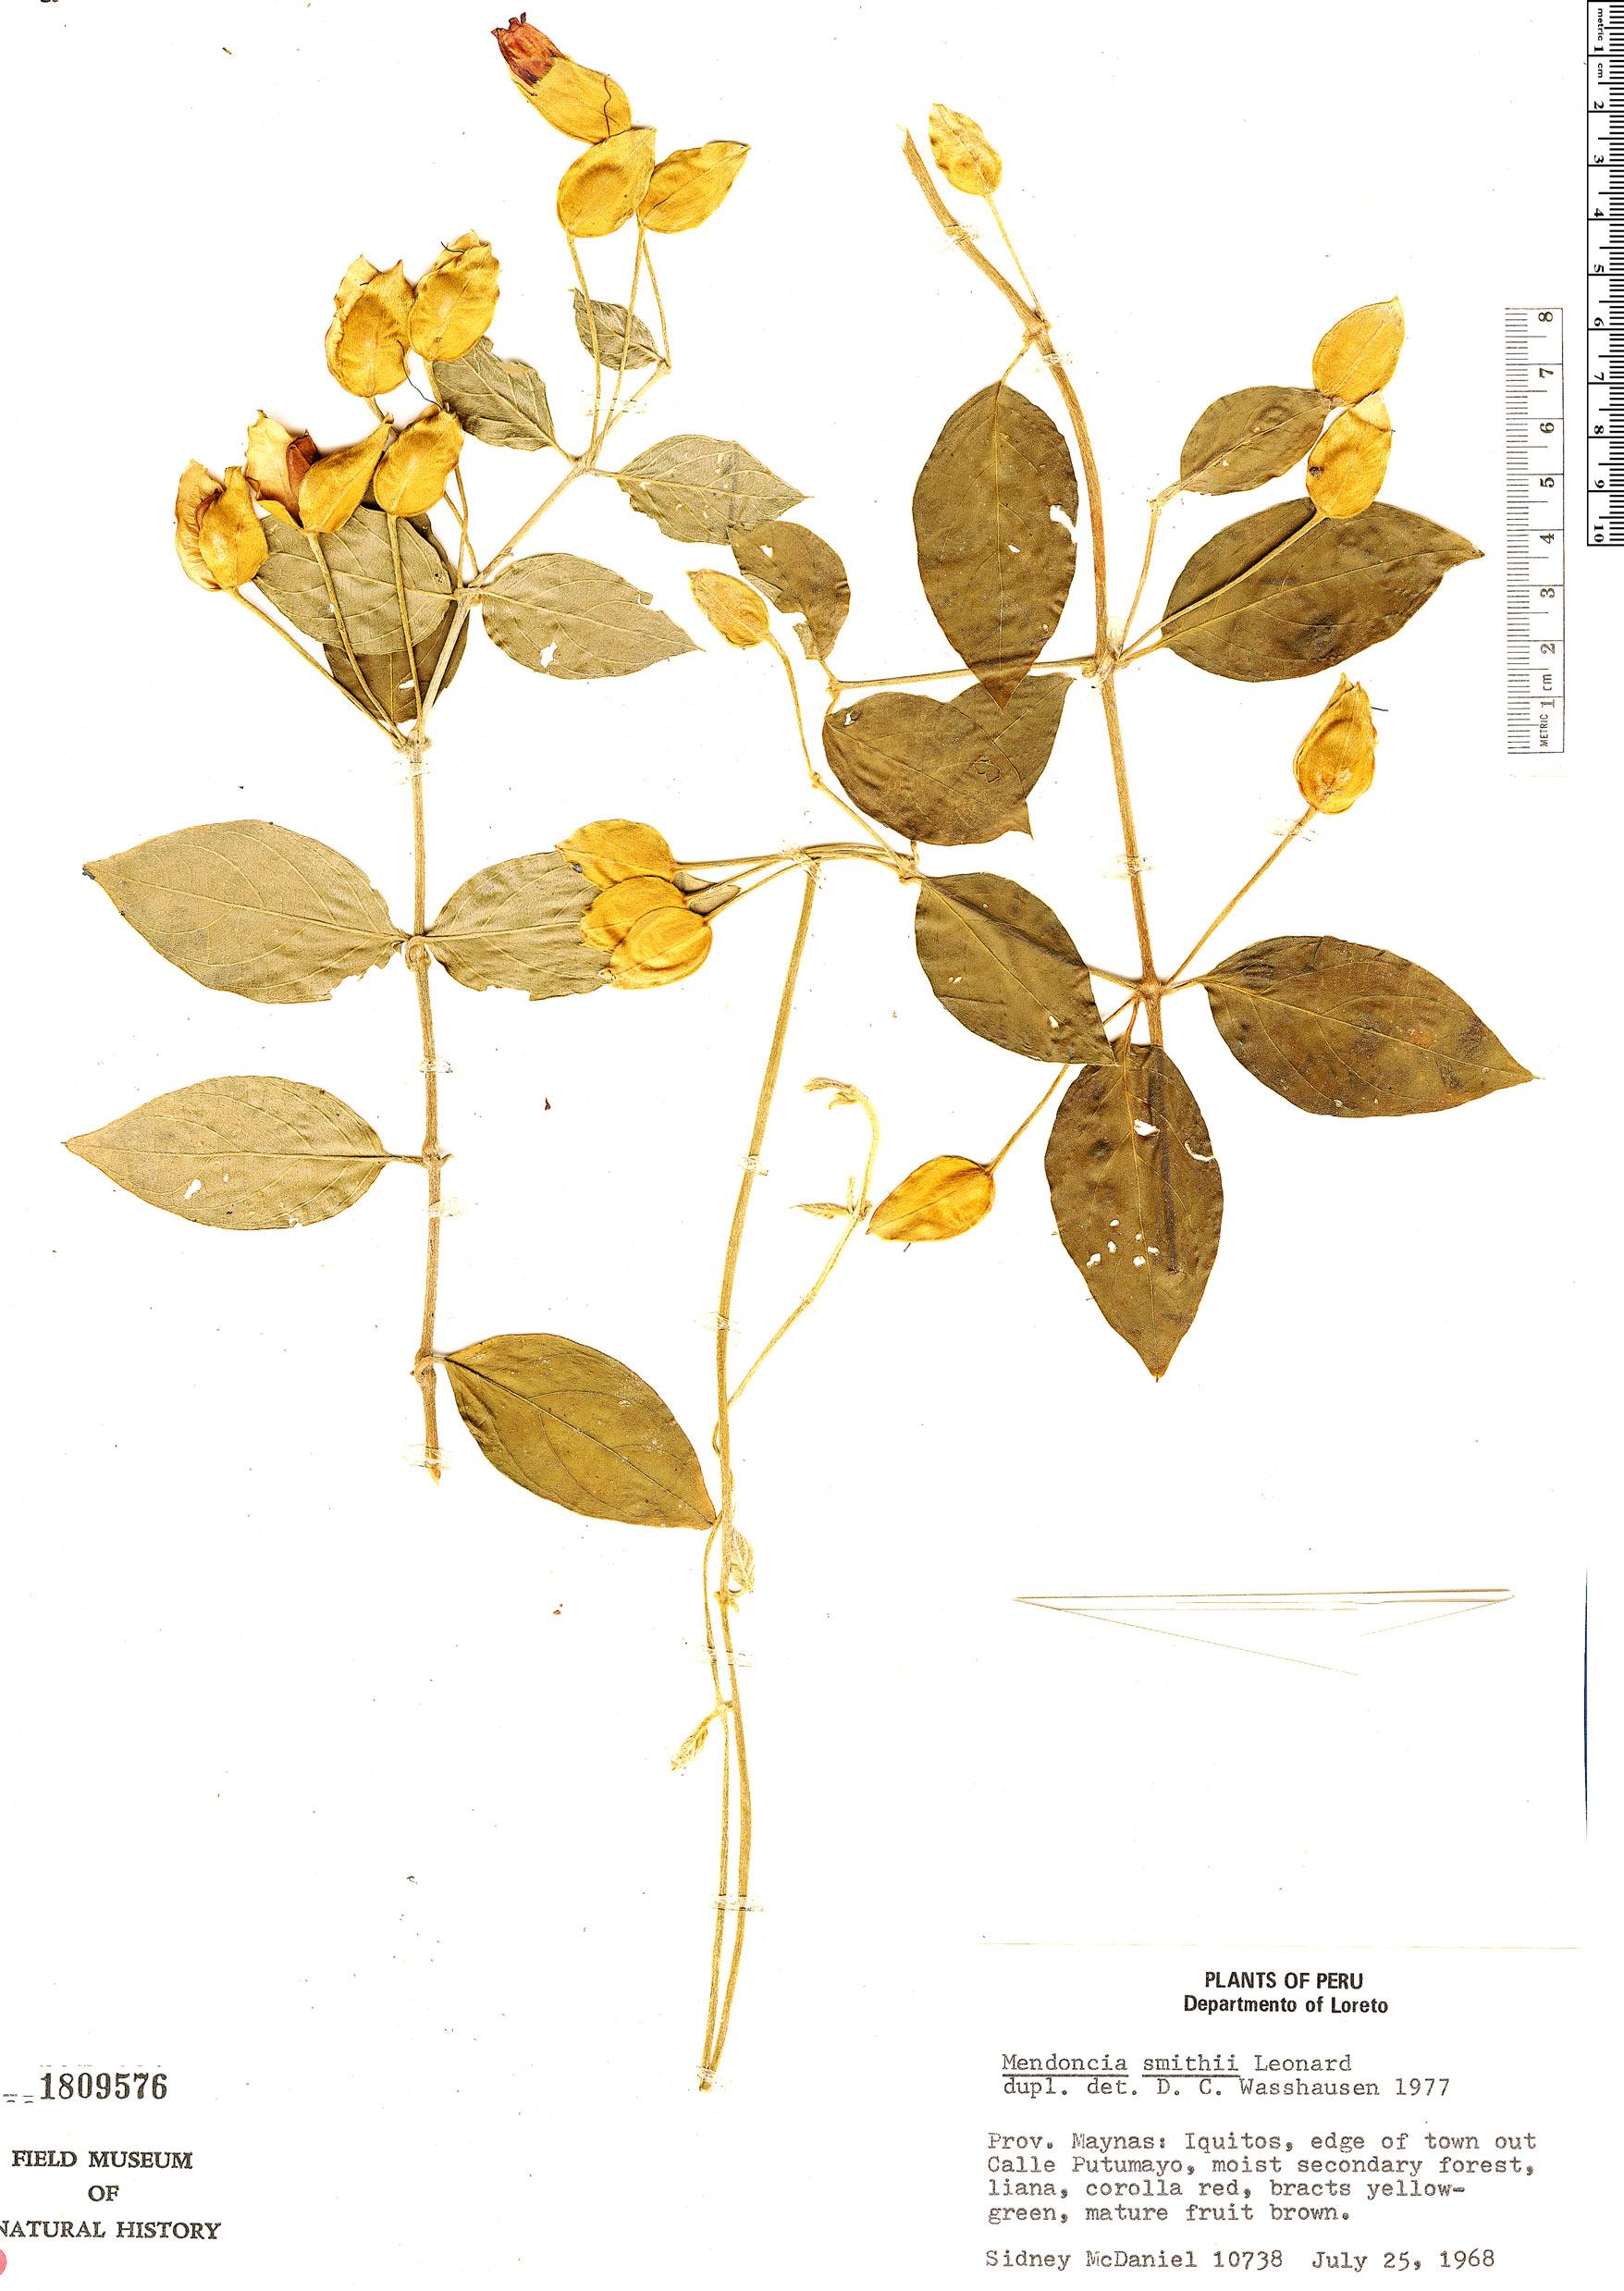 Specimen: Mendoncia smithii